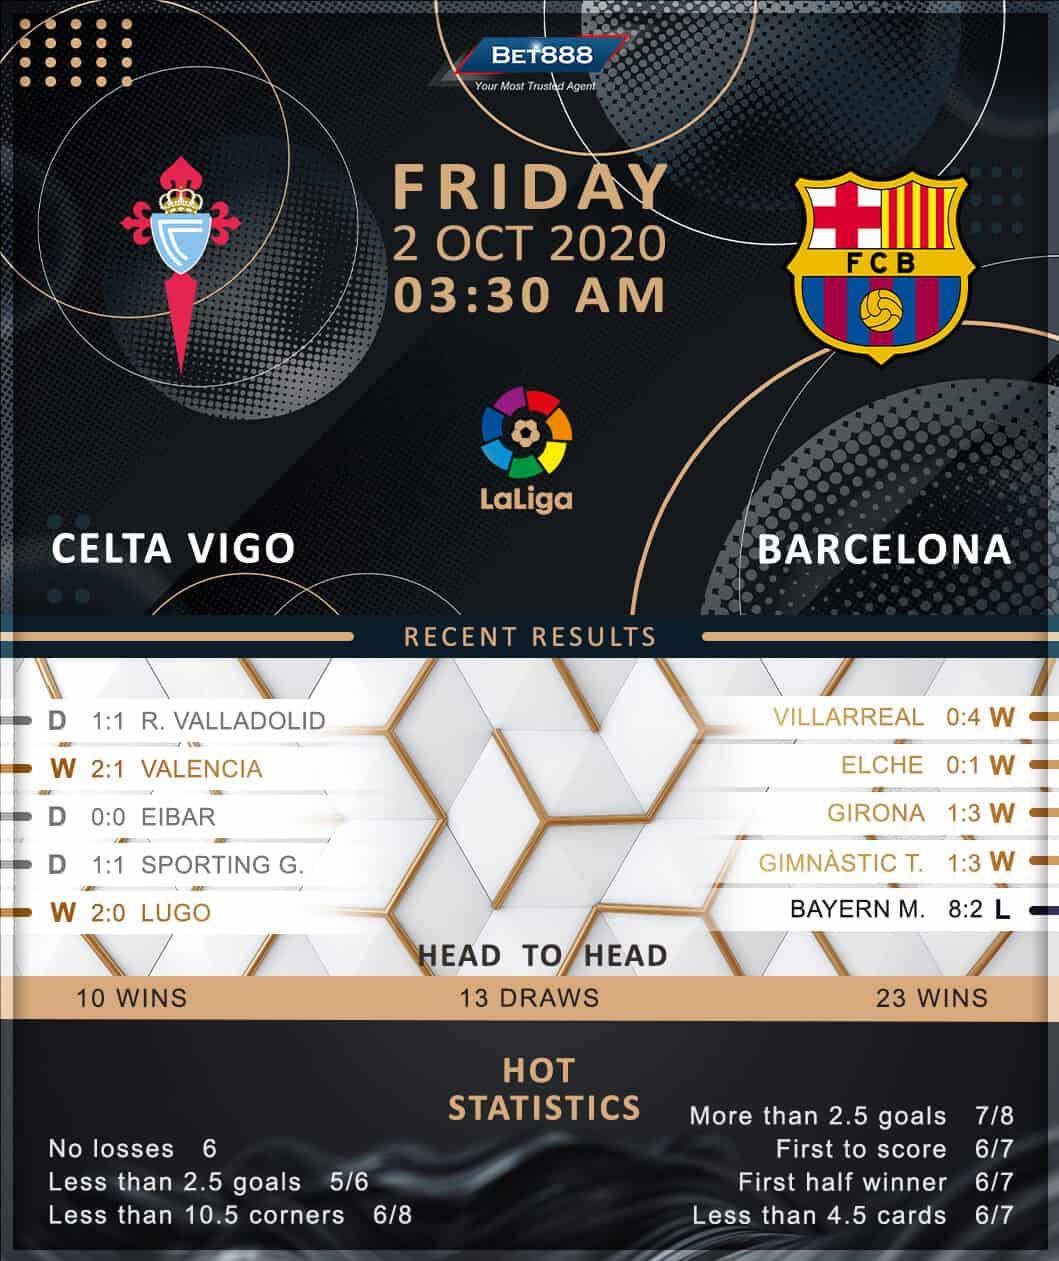 Celta Vigo vs Barcelona 02/10/20